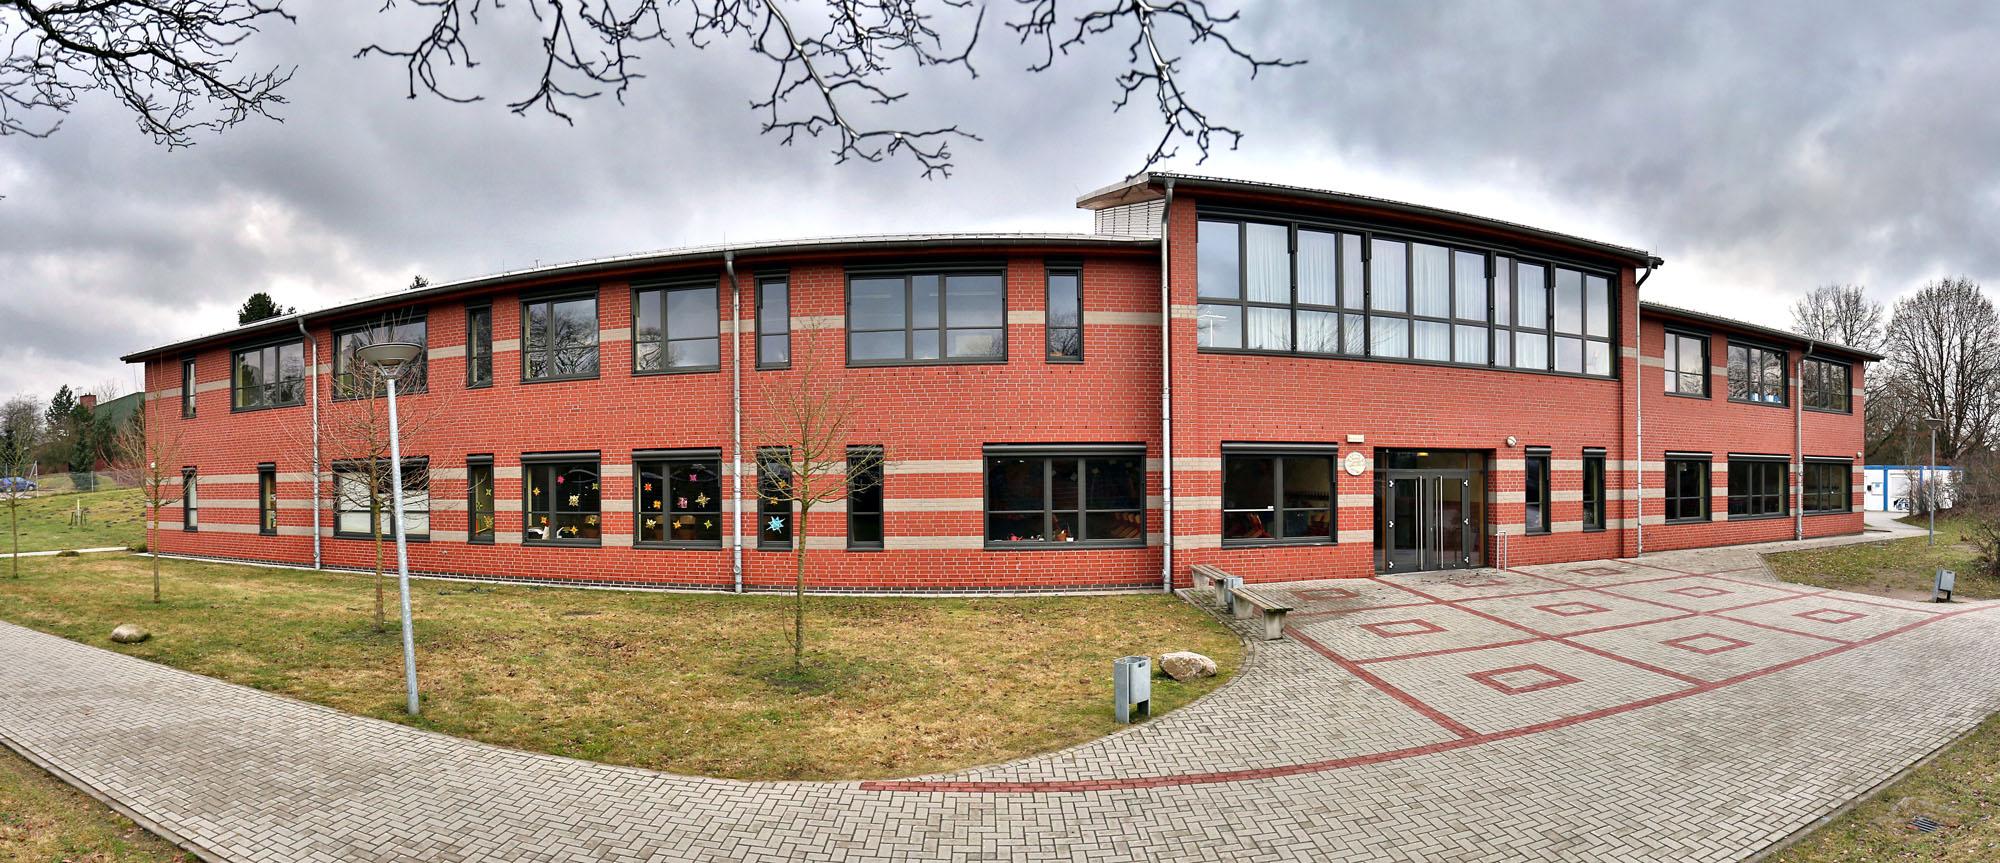 Estetalschule Hollenstedt